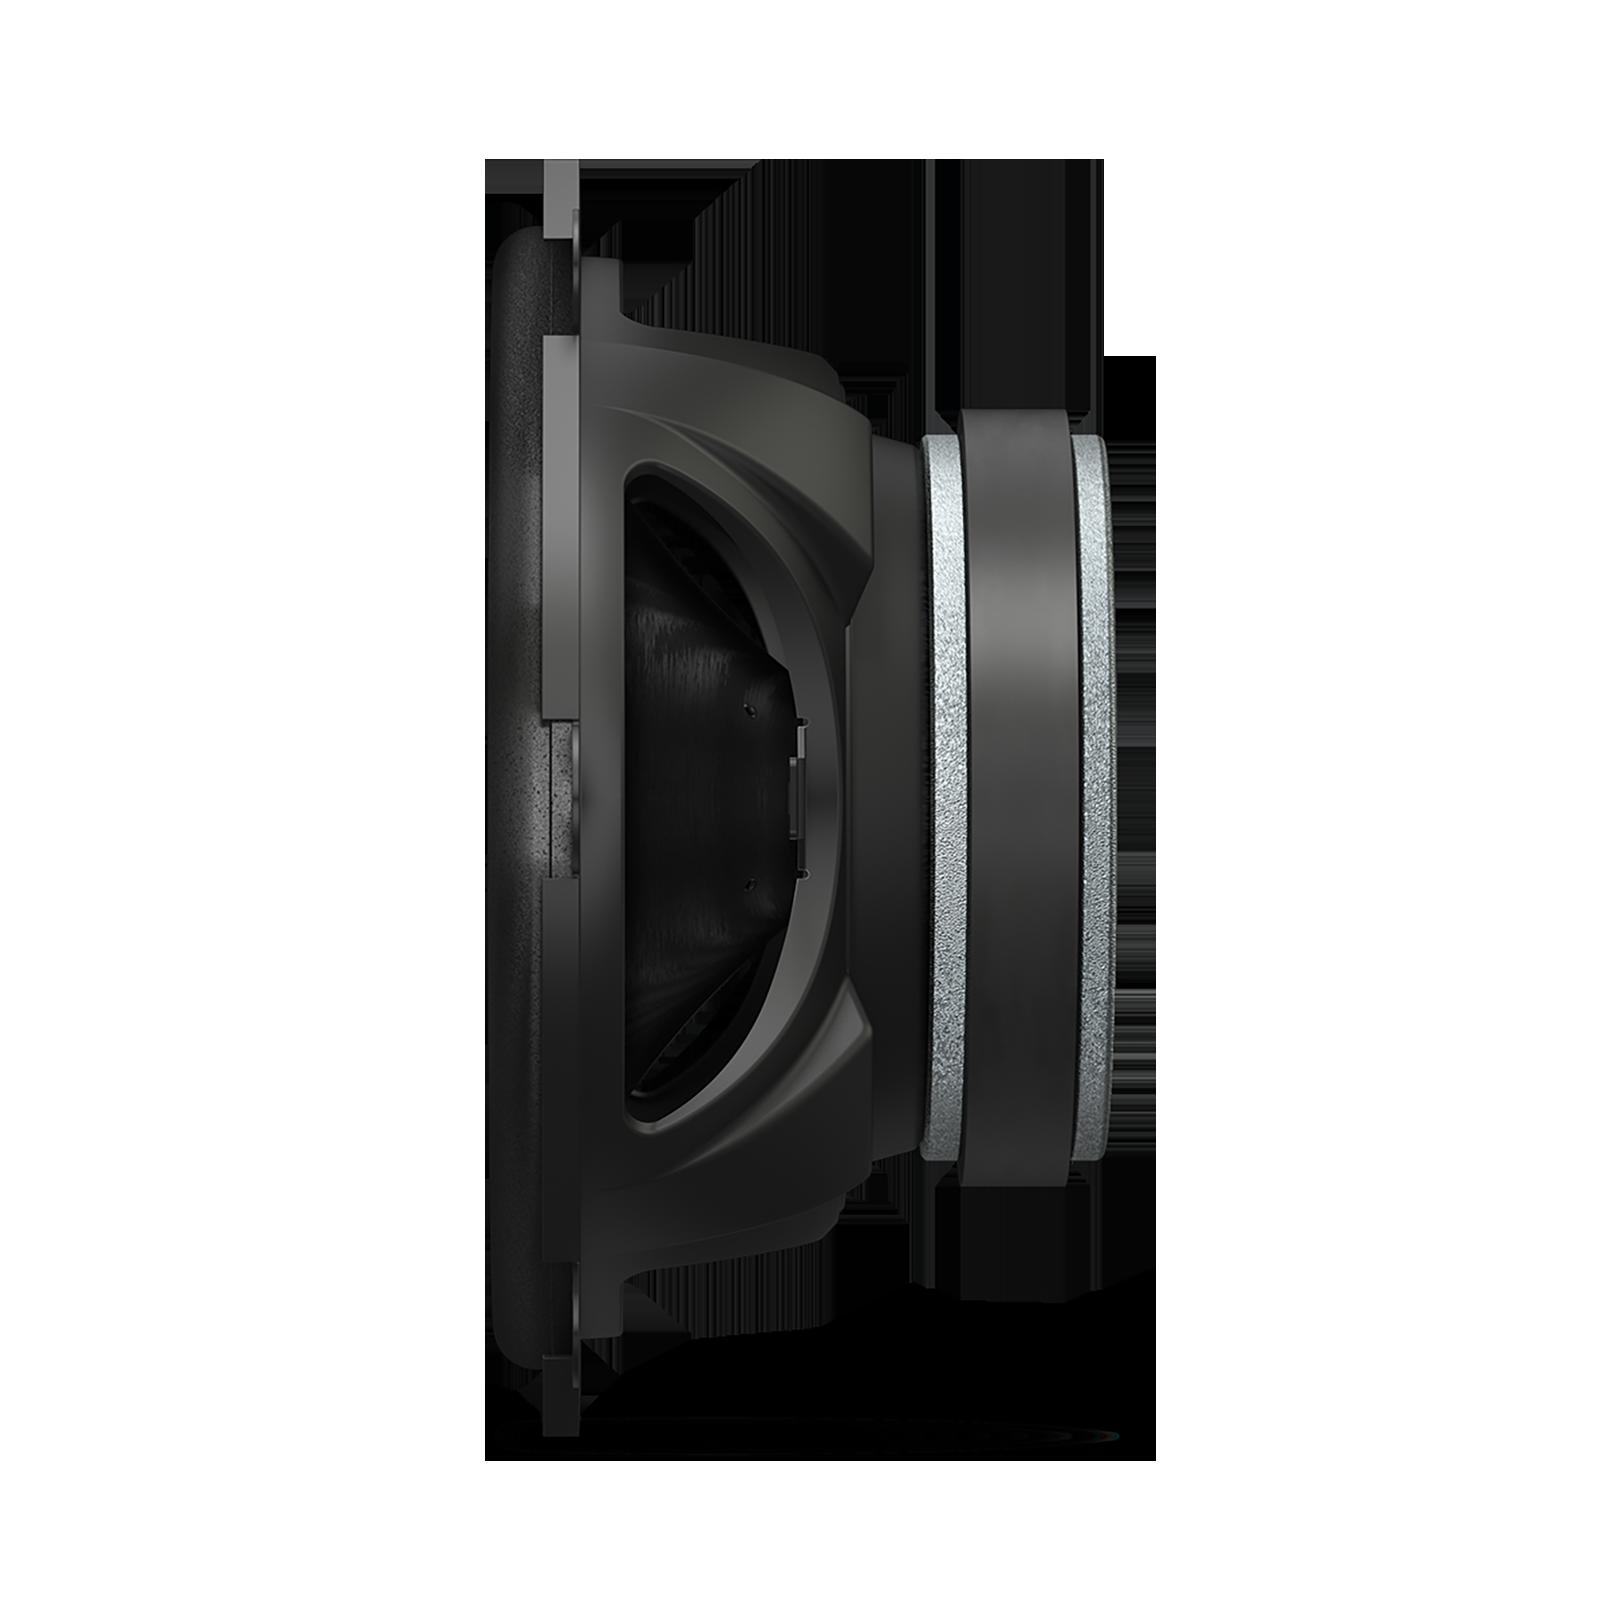 "GX862 - Black - 5"" x 7"" / 6"" x 8"" coaxial car audio loudspeaker, 180W - Detailshot 1"